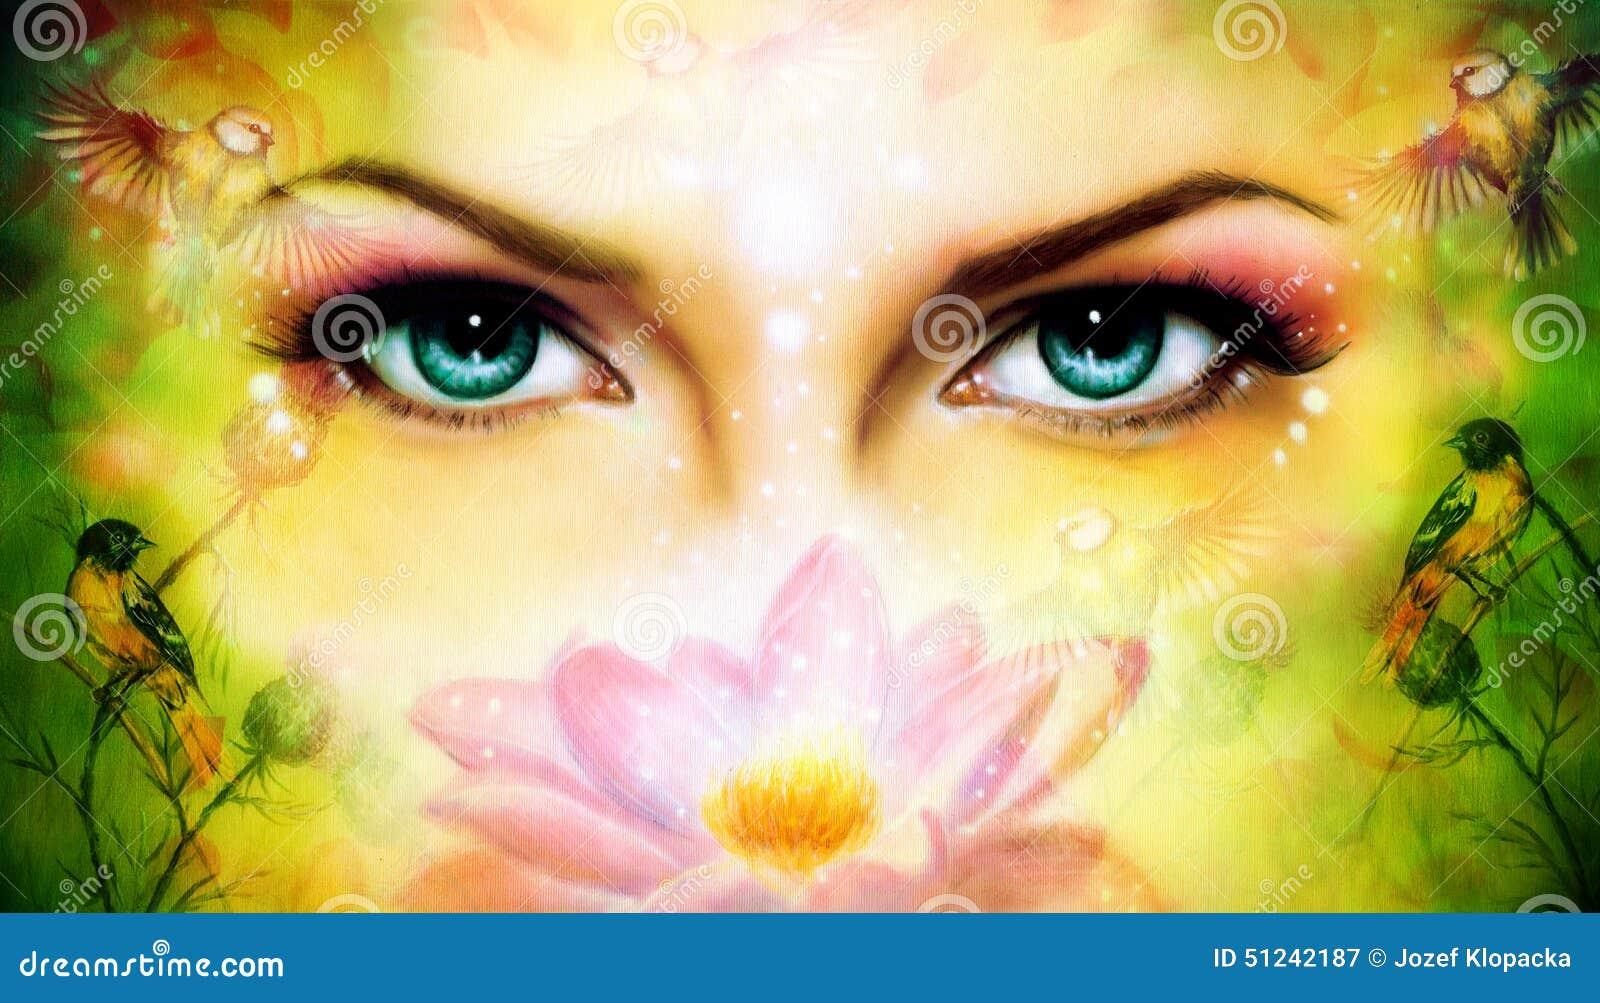 pair of beautiful blue women eyes beaming up enchanting